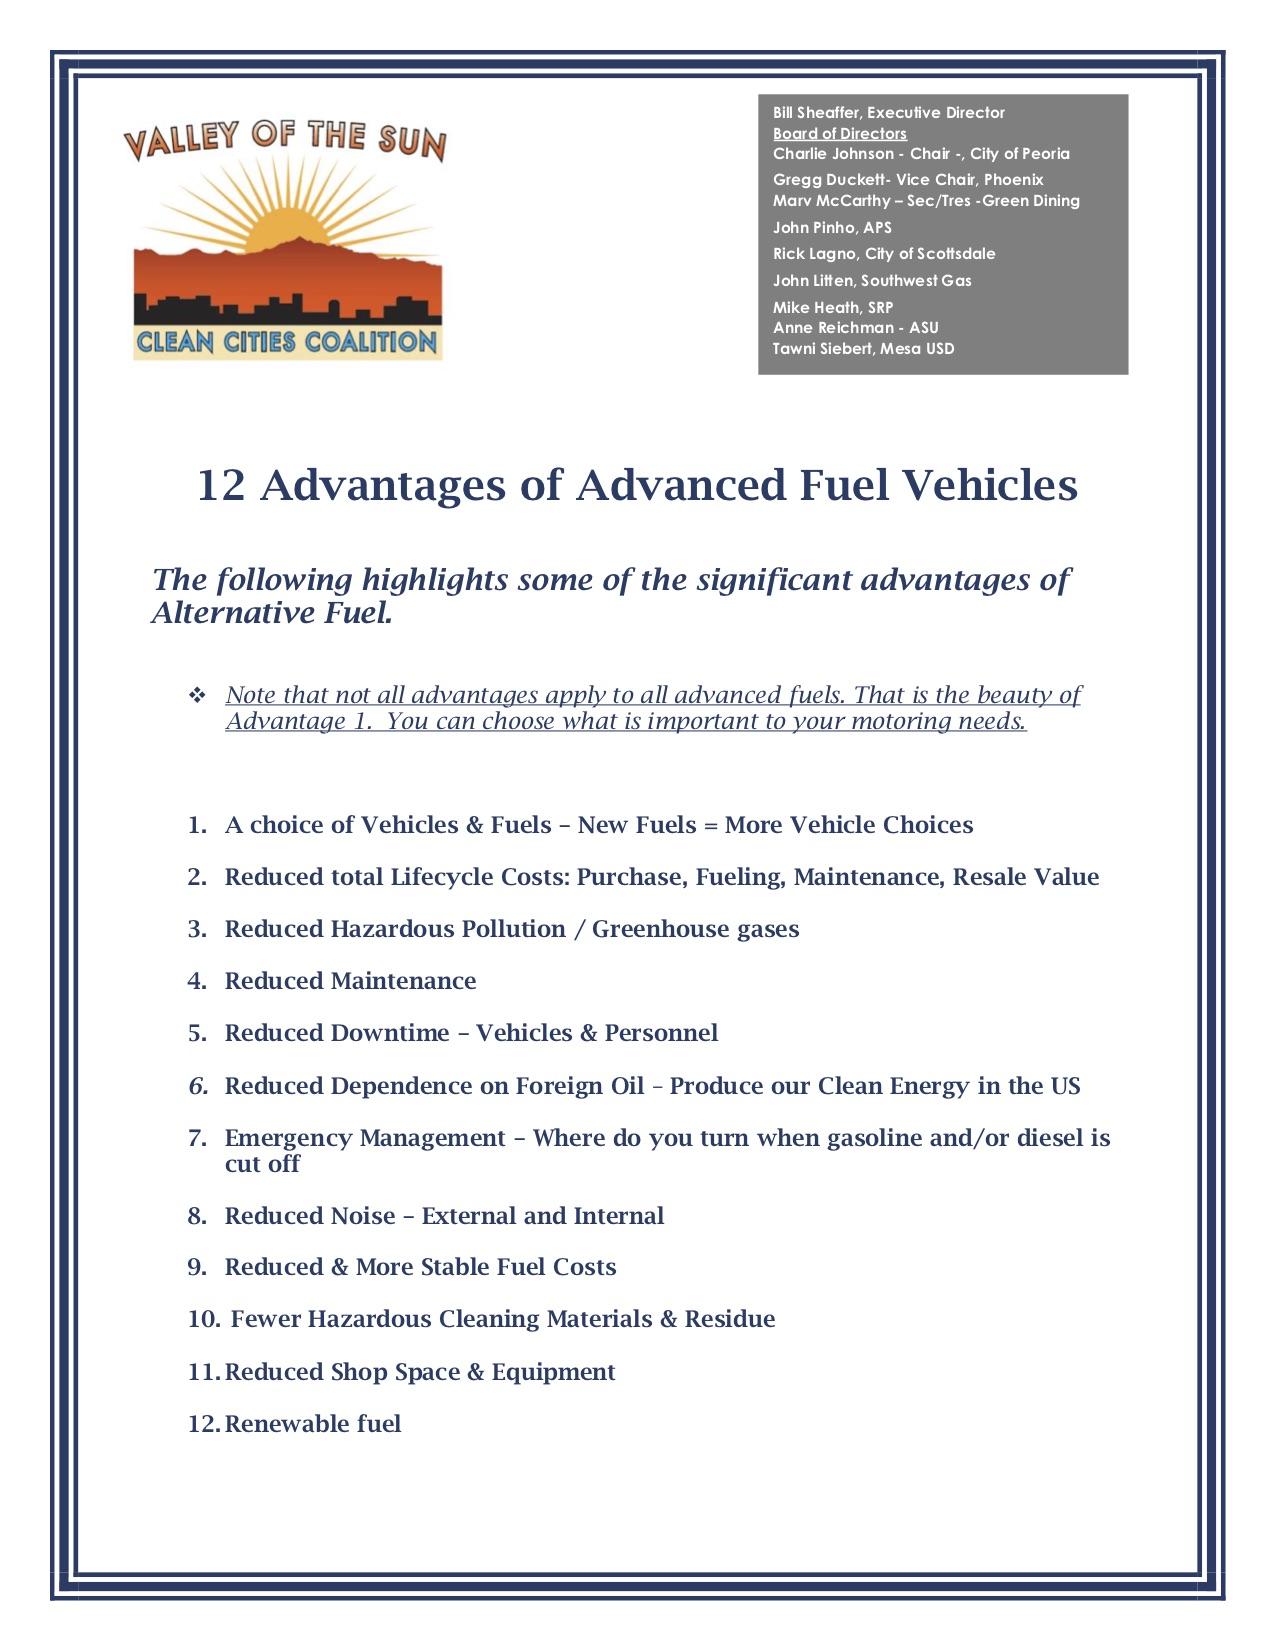 12 Advantages of Advanced Fuel   Vehicles.jpg